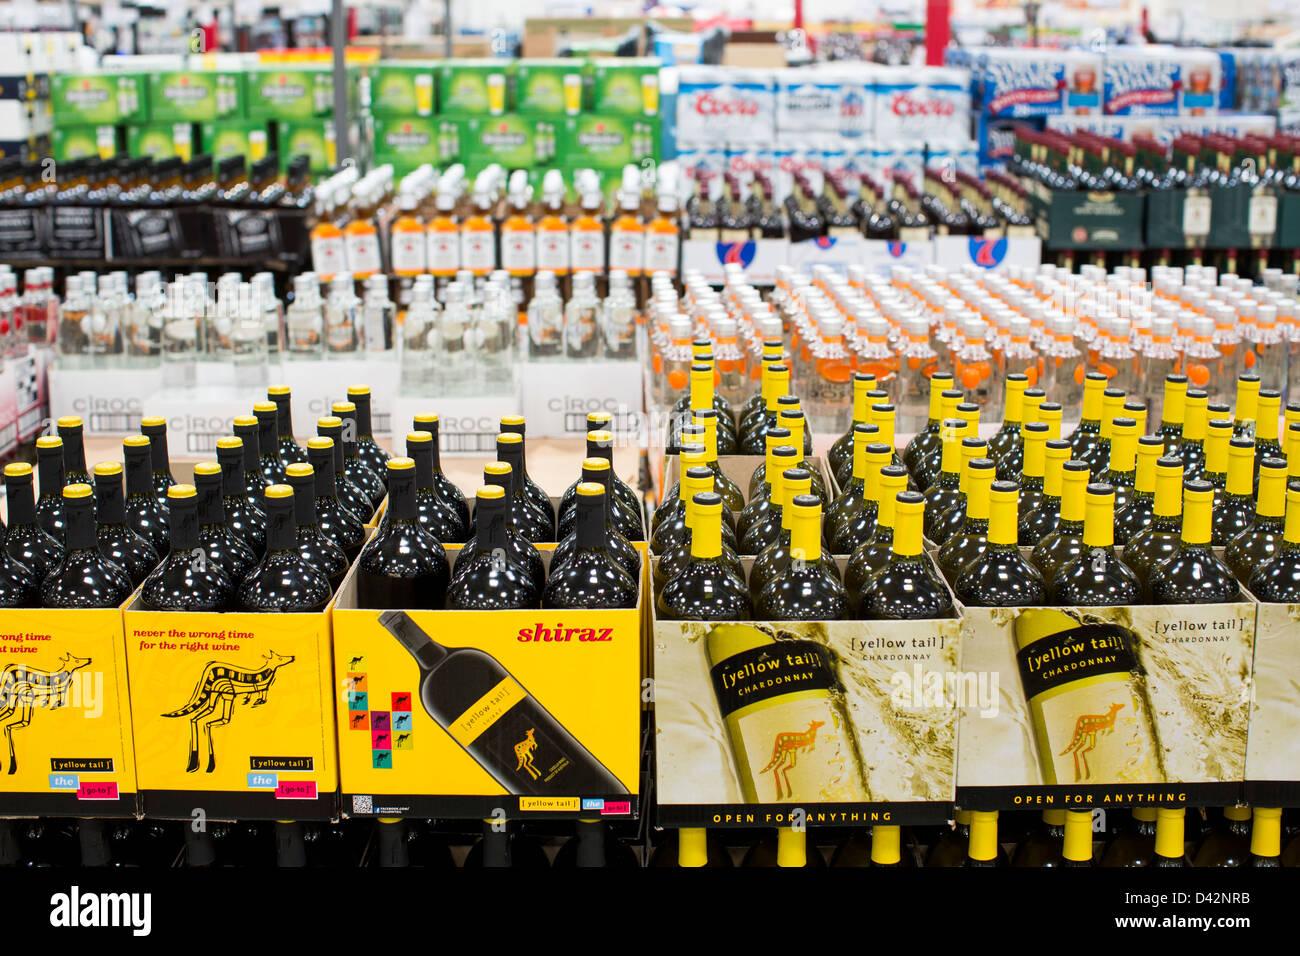 Yellow Tail Shiraz und Chardonnay Wein auf dem Display an einem Costco Wholesale Warehouse Club. Stockbild